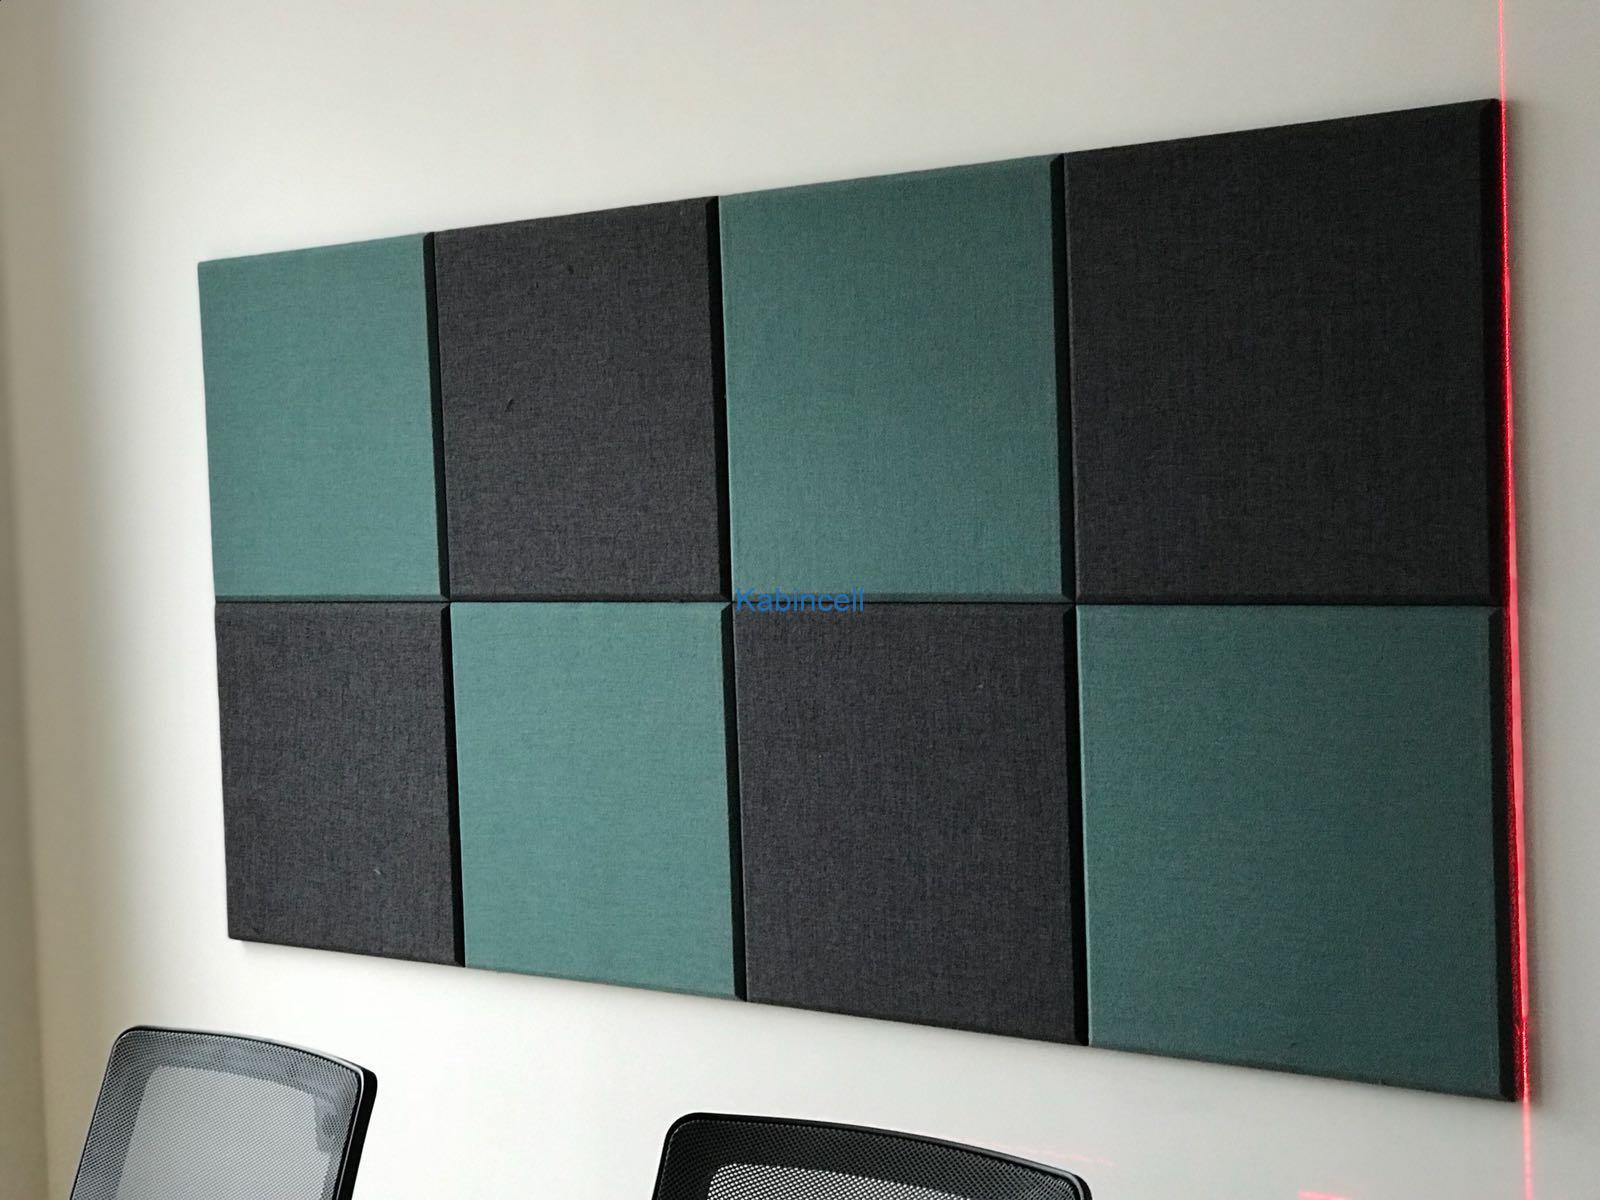 ofis-akustik-panel-kaplama-ses-ve-yanki-yalitimi2